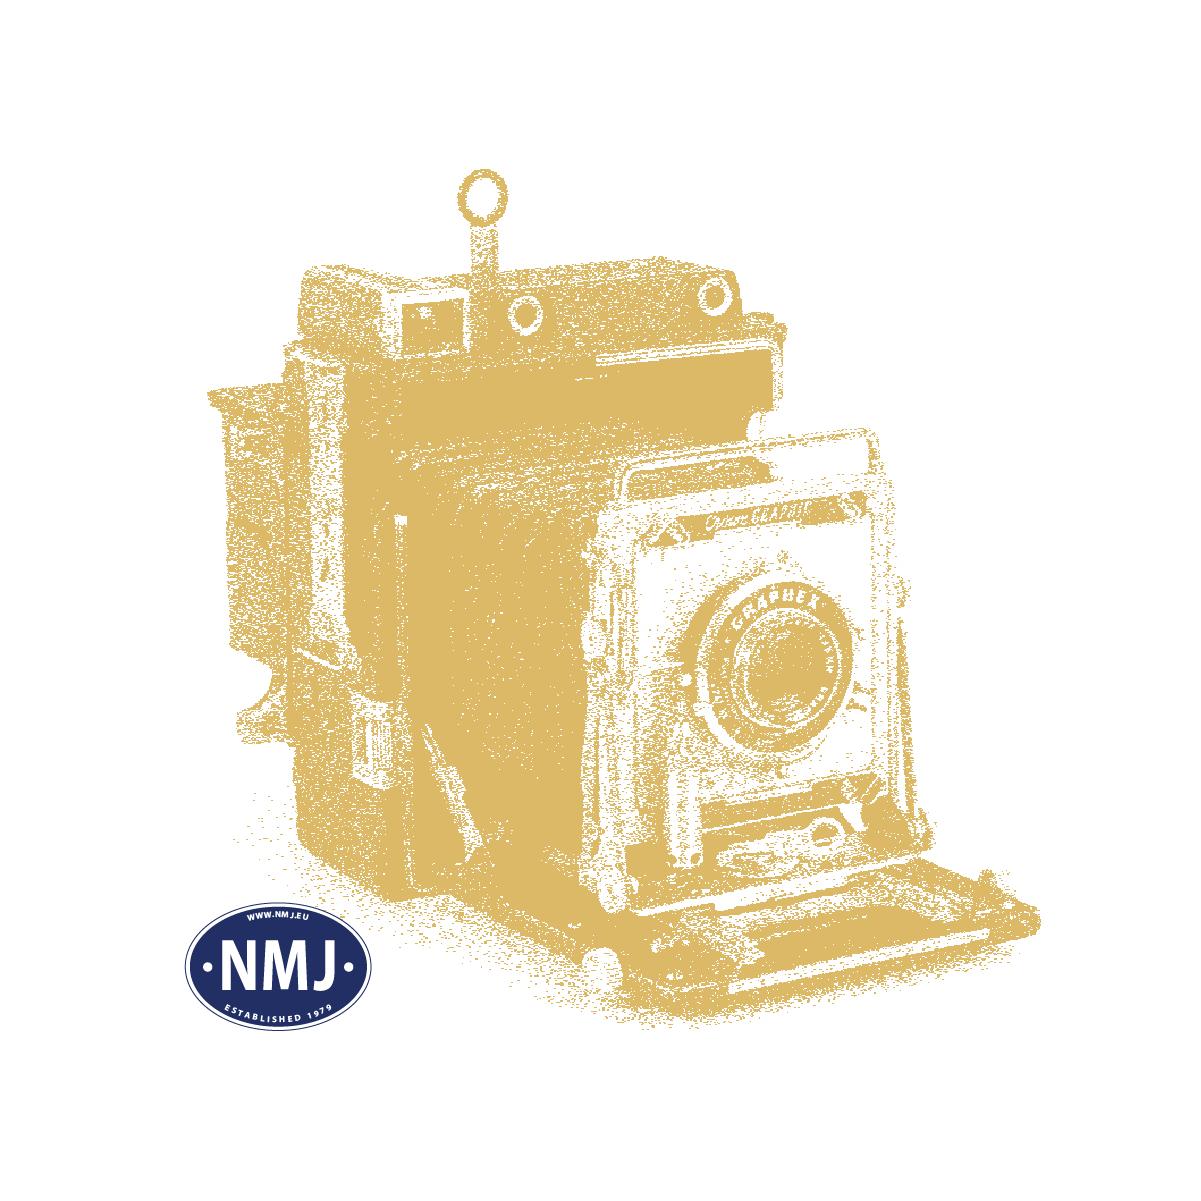 MWB-PW403 - Gresstuster m/ Ugress, 4,5 mm, Sen Sommer, 21 x 15 Cm